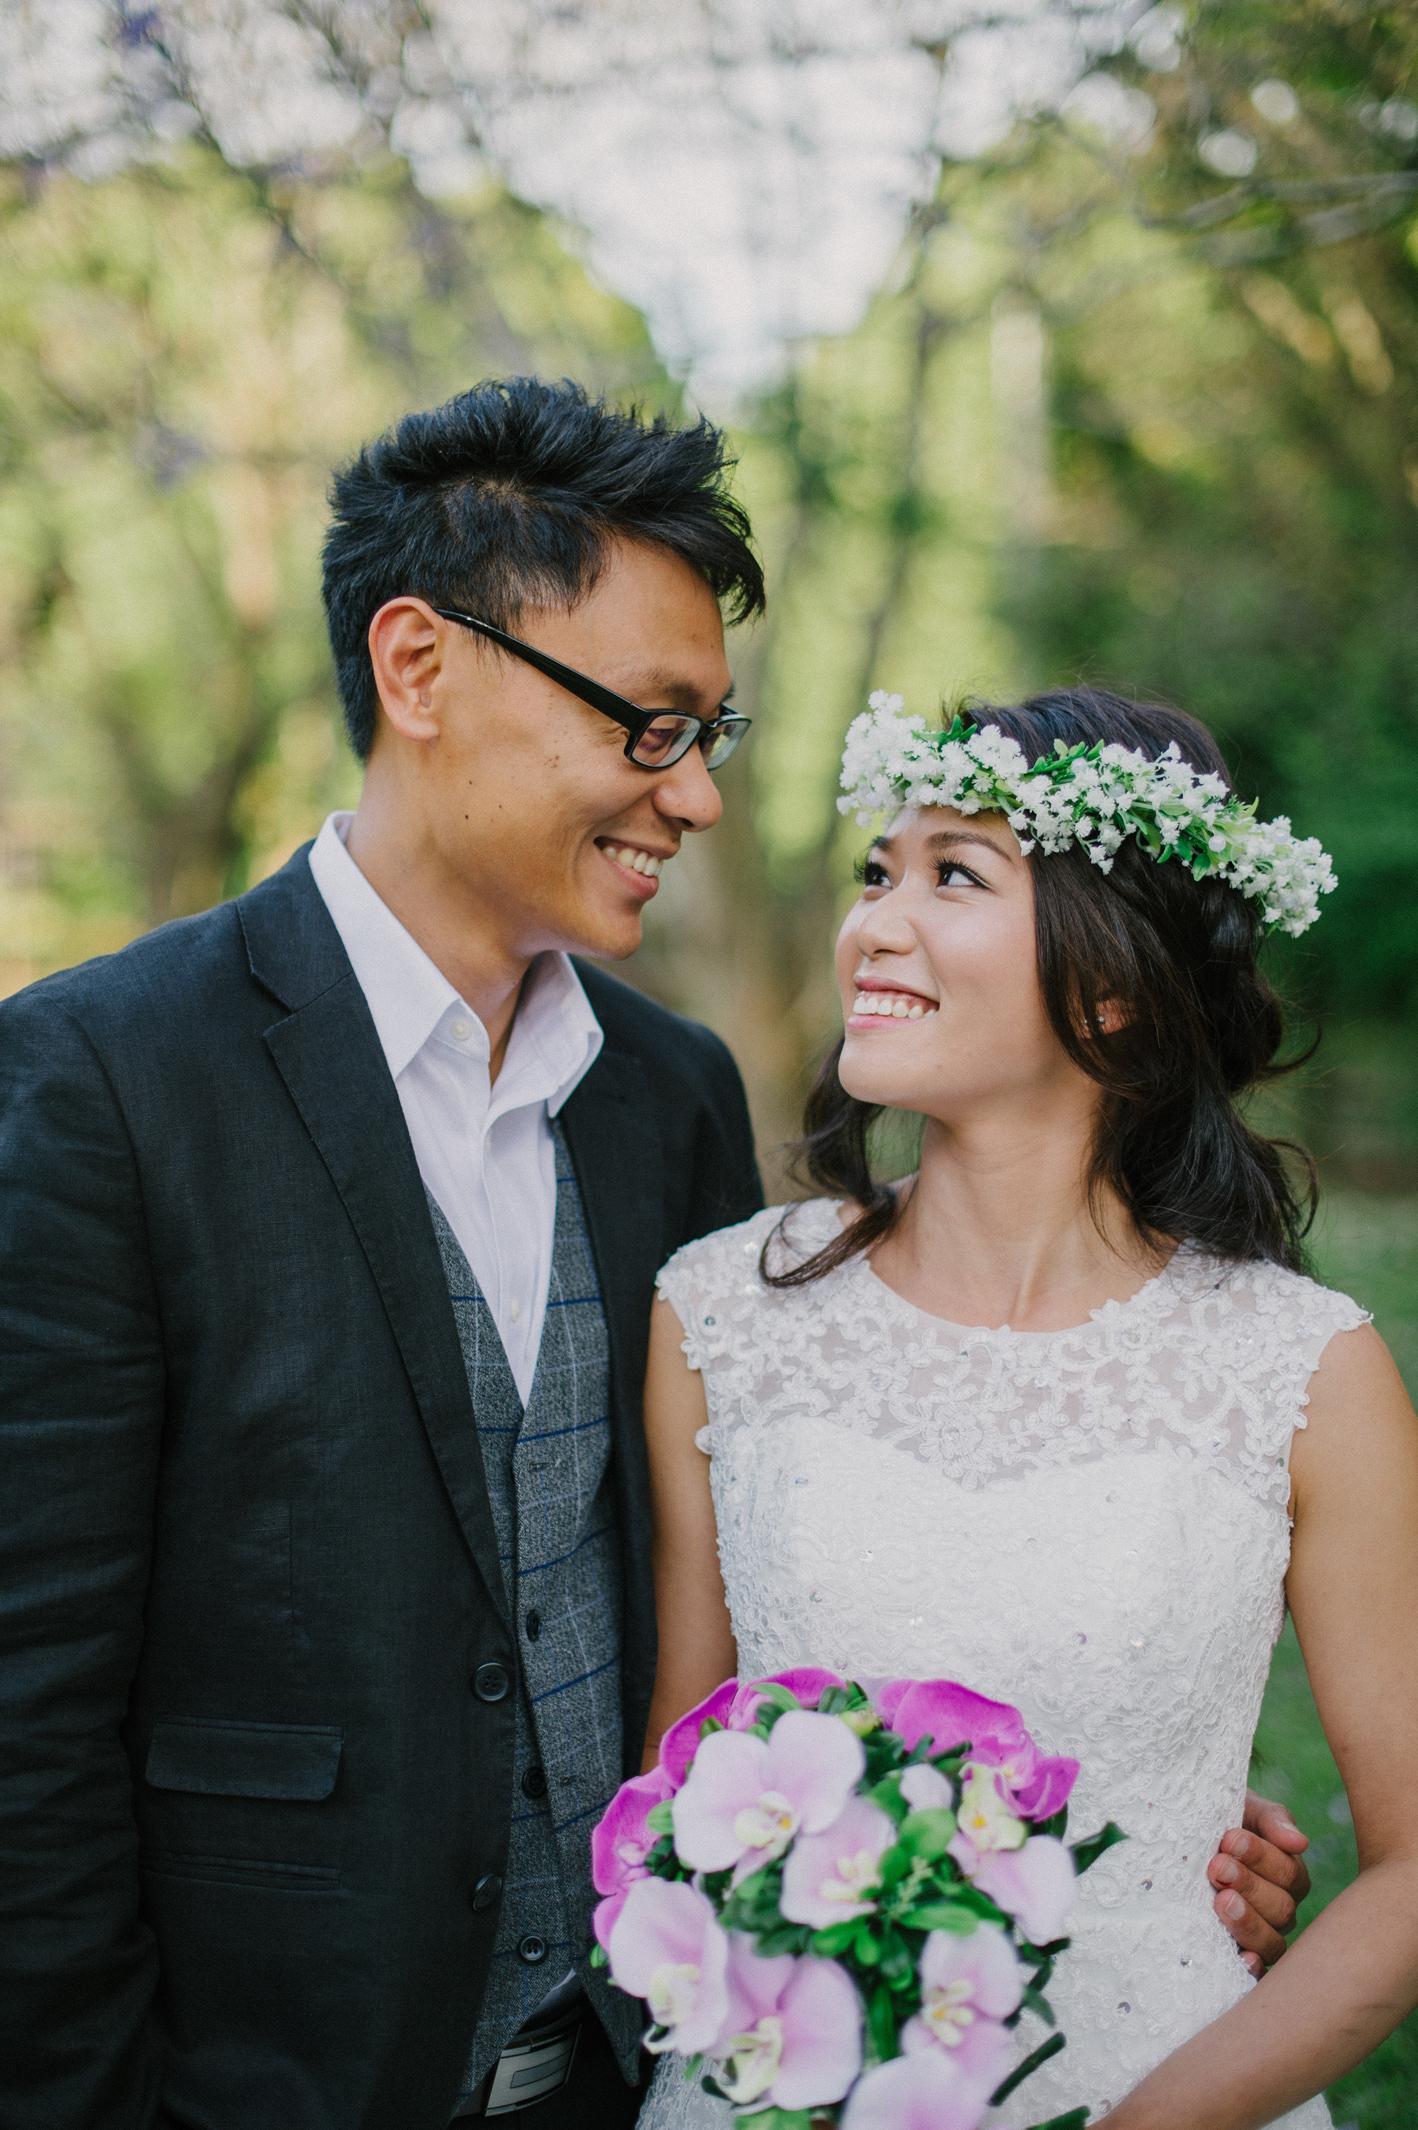 002-ed-janet-currumbin-wedding_sophie-baker-photography